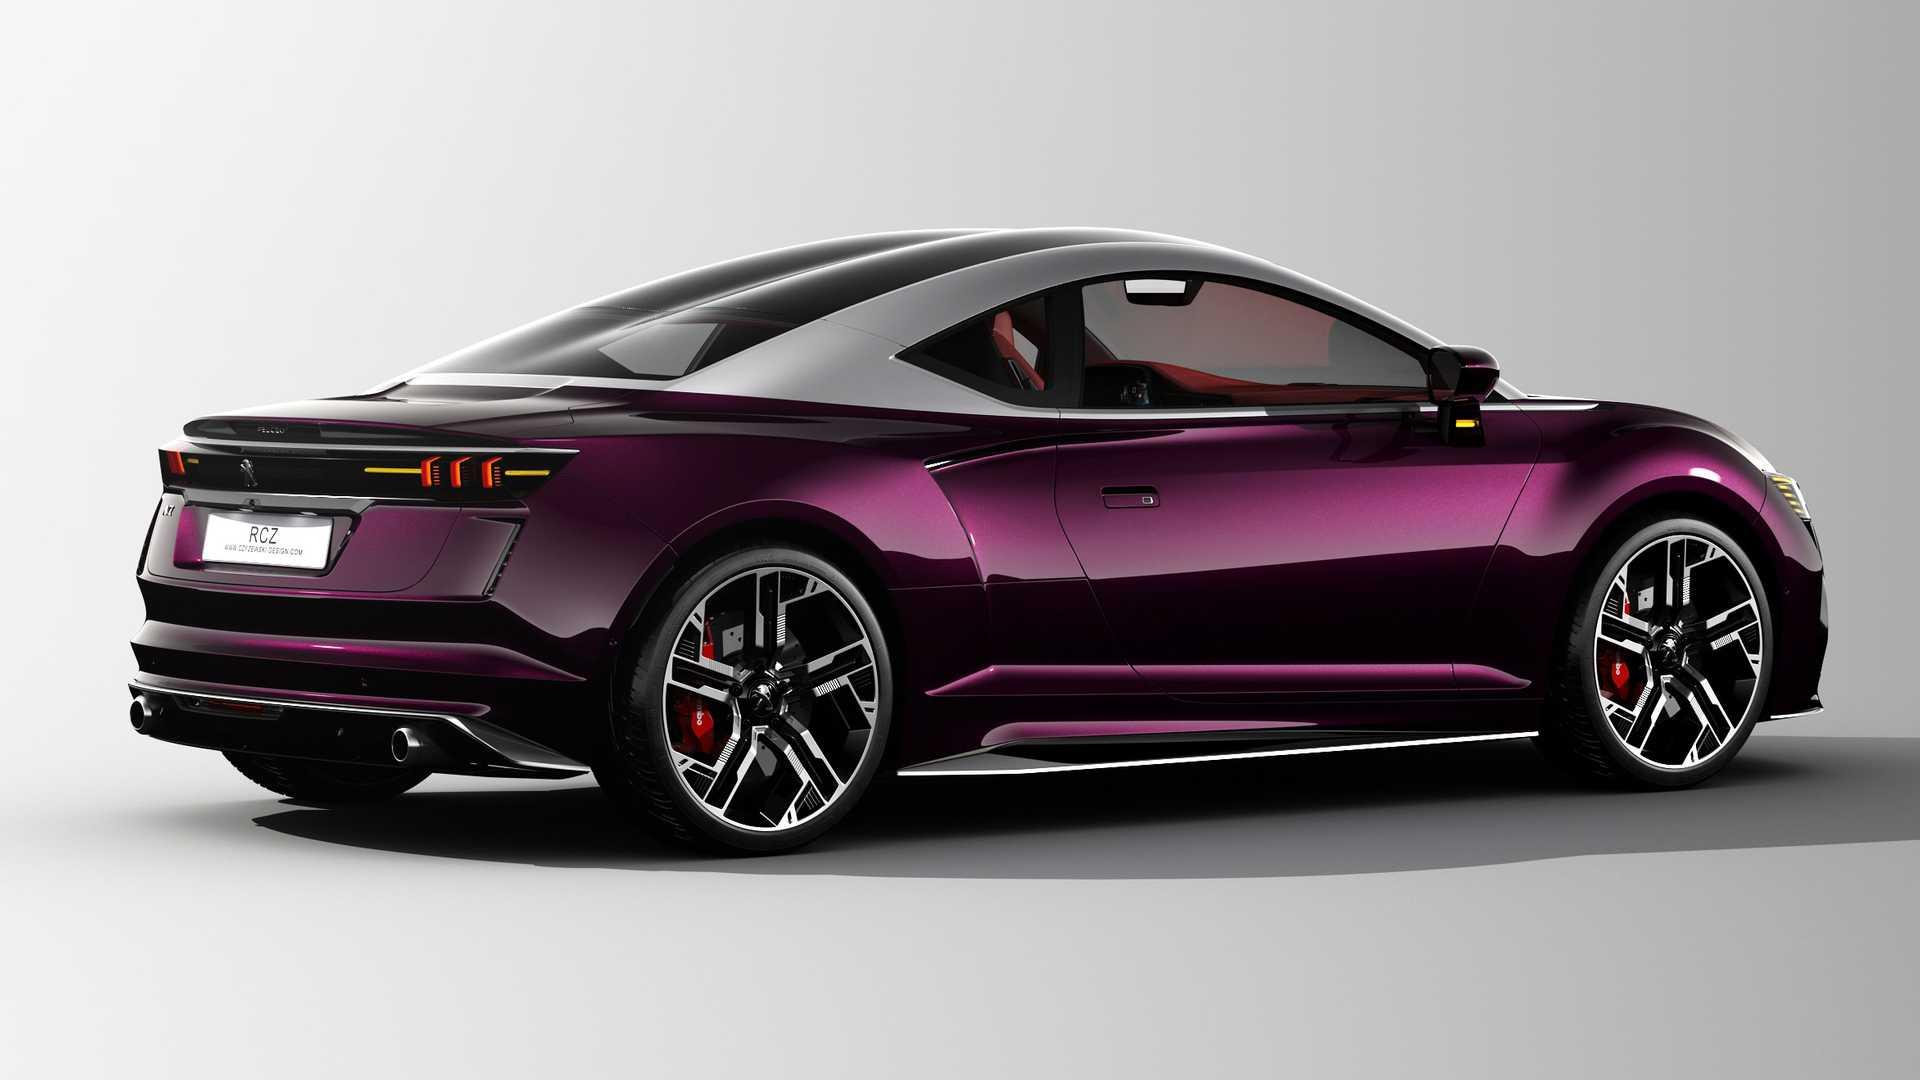 2020_Peugeot_RCZ_rendering_0001